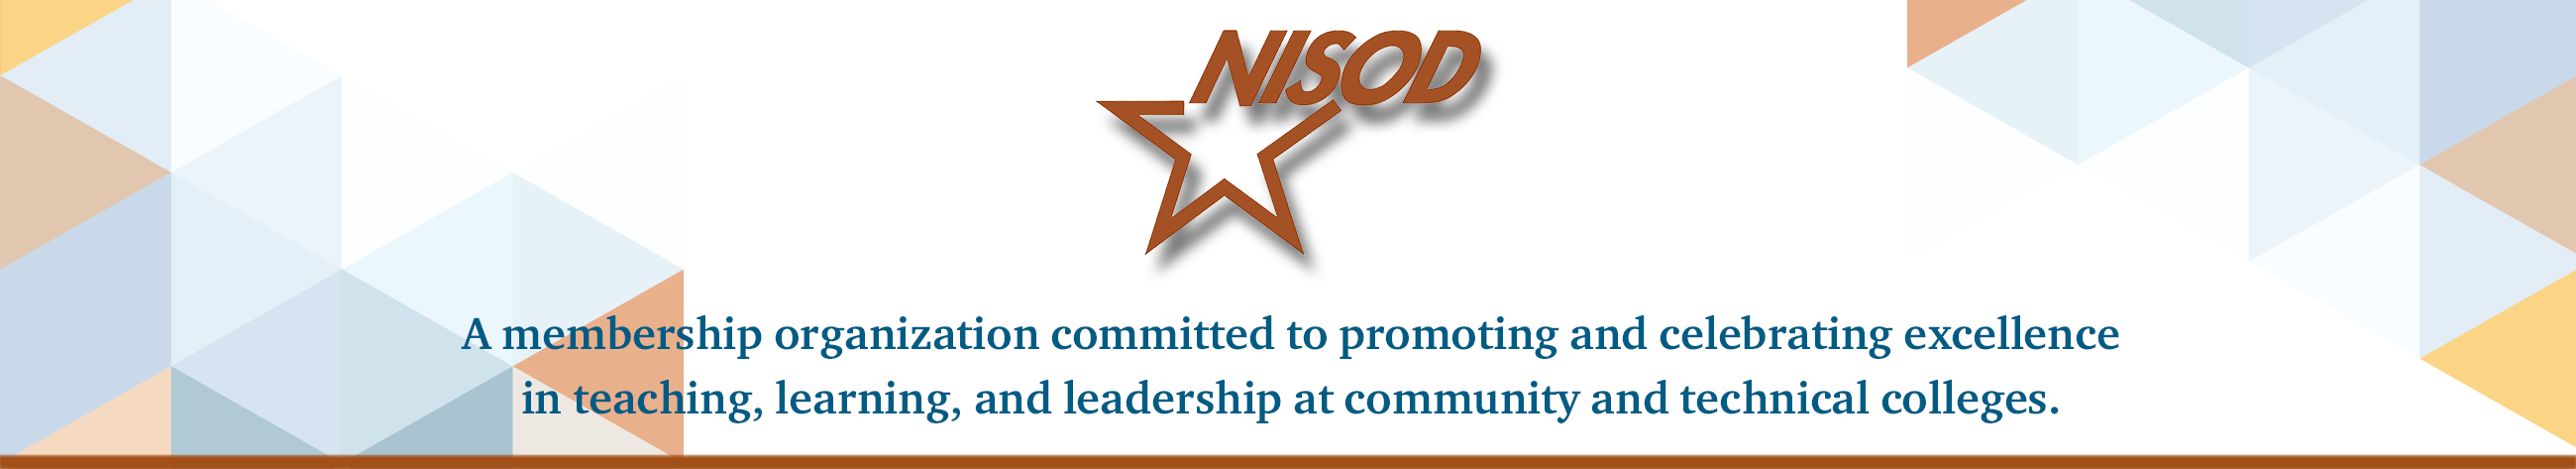 NISOD Logo and Header